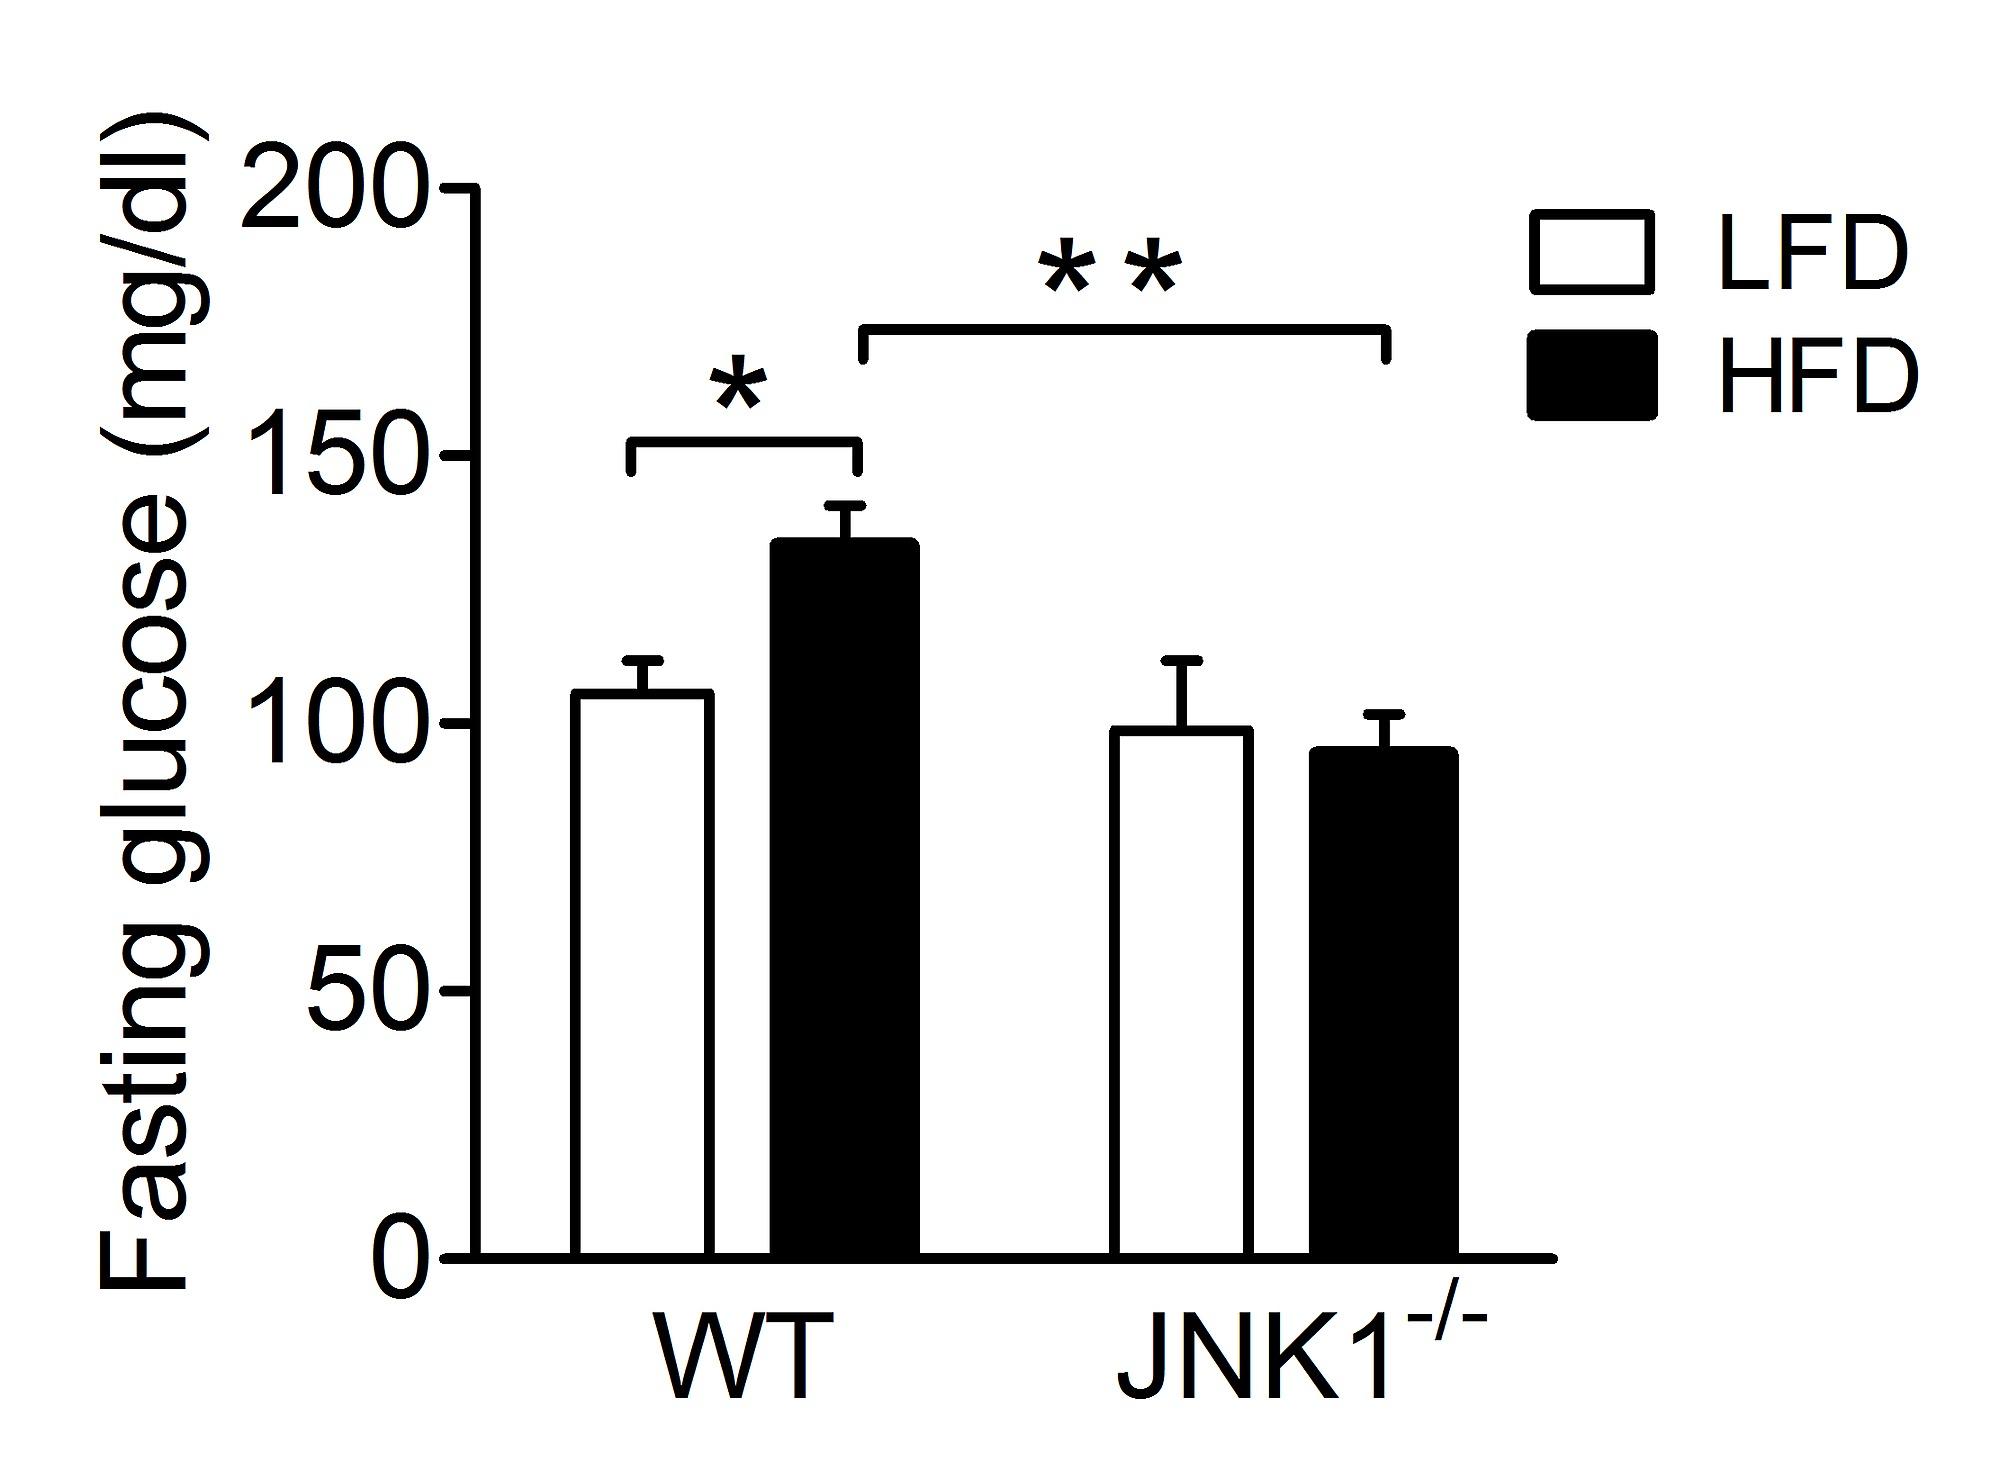 Cjun Aminoterminal Kinase1 Mediates Glucoseresponsive. Wiring. Ricon S Series Wiring Diagram 1231 At Scoala.co